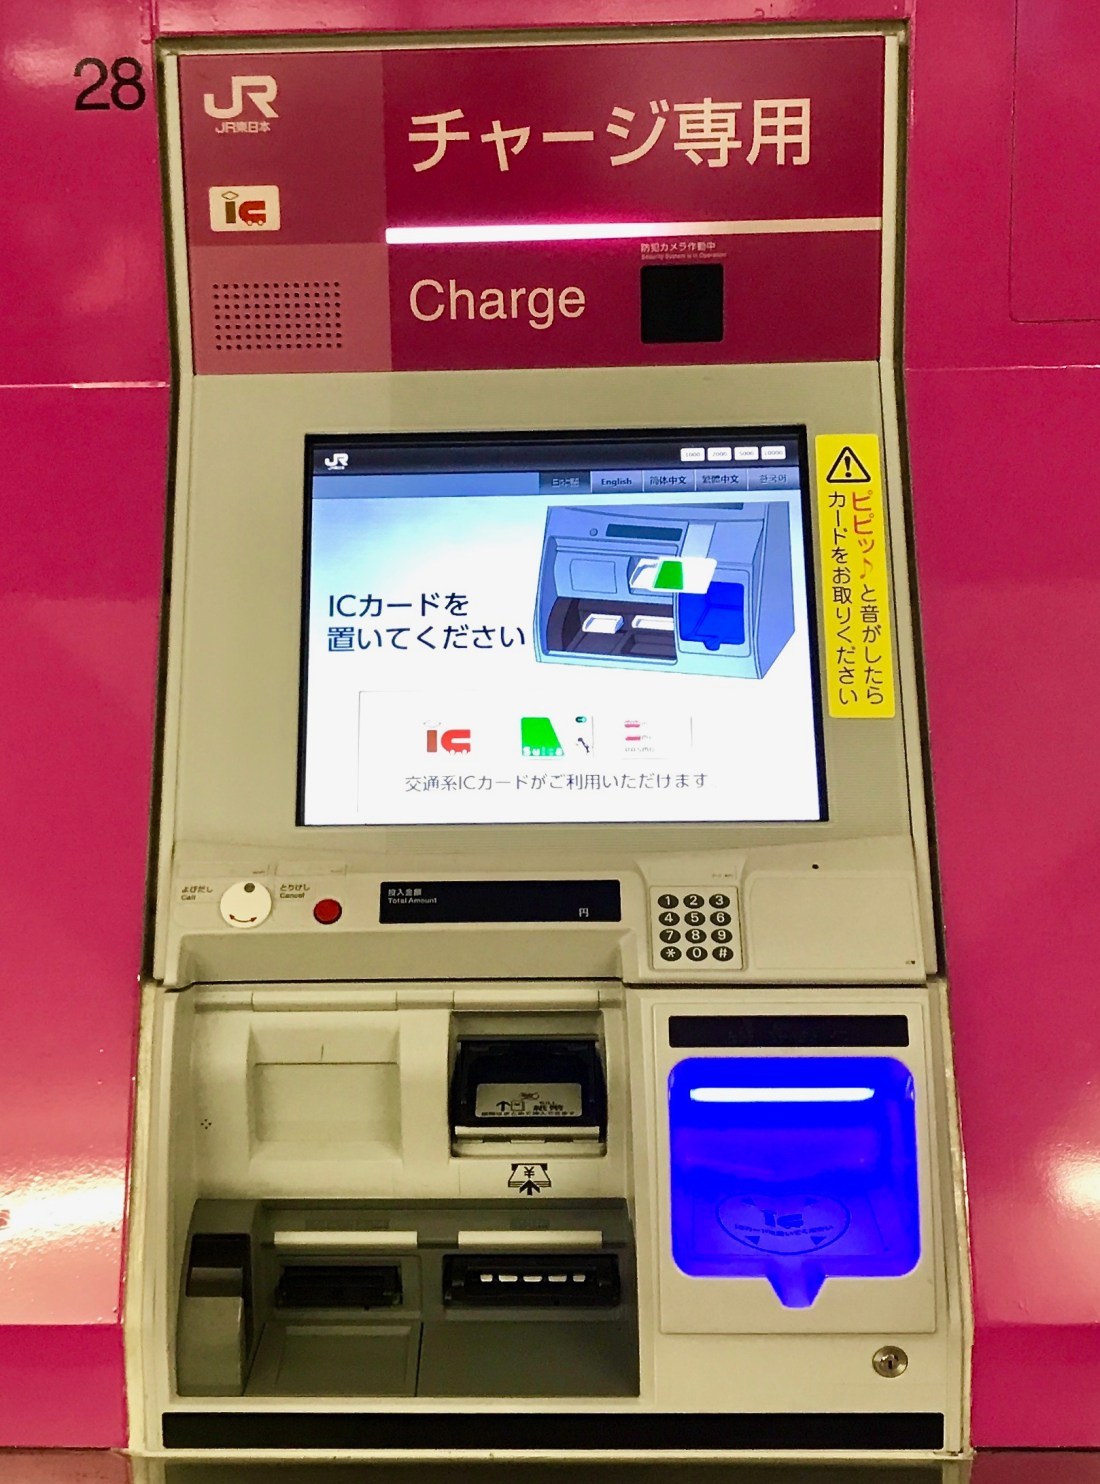 Suica Charge Kiosk at JR station